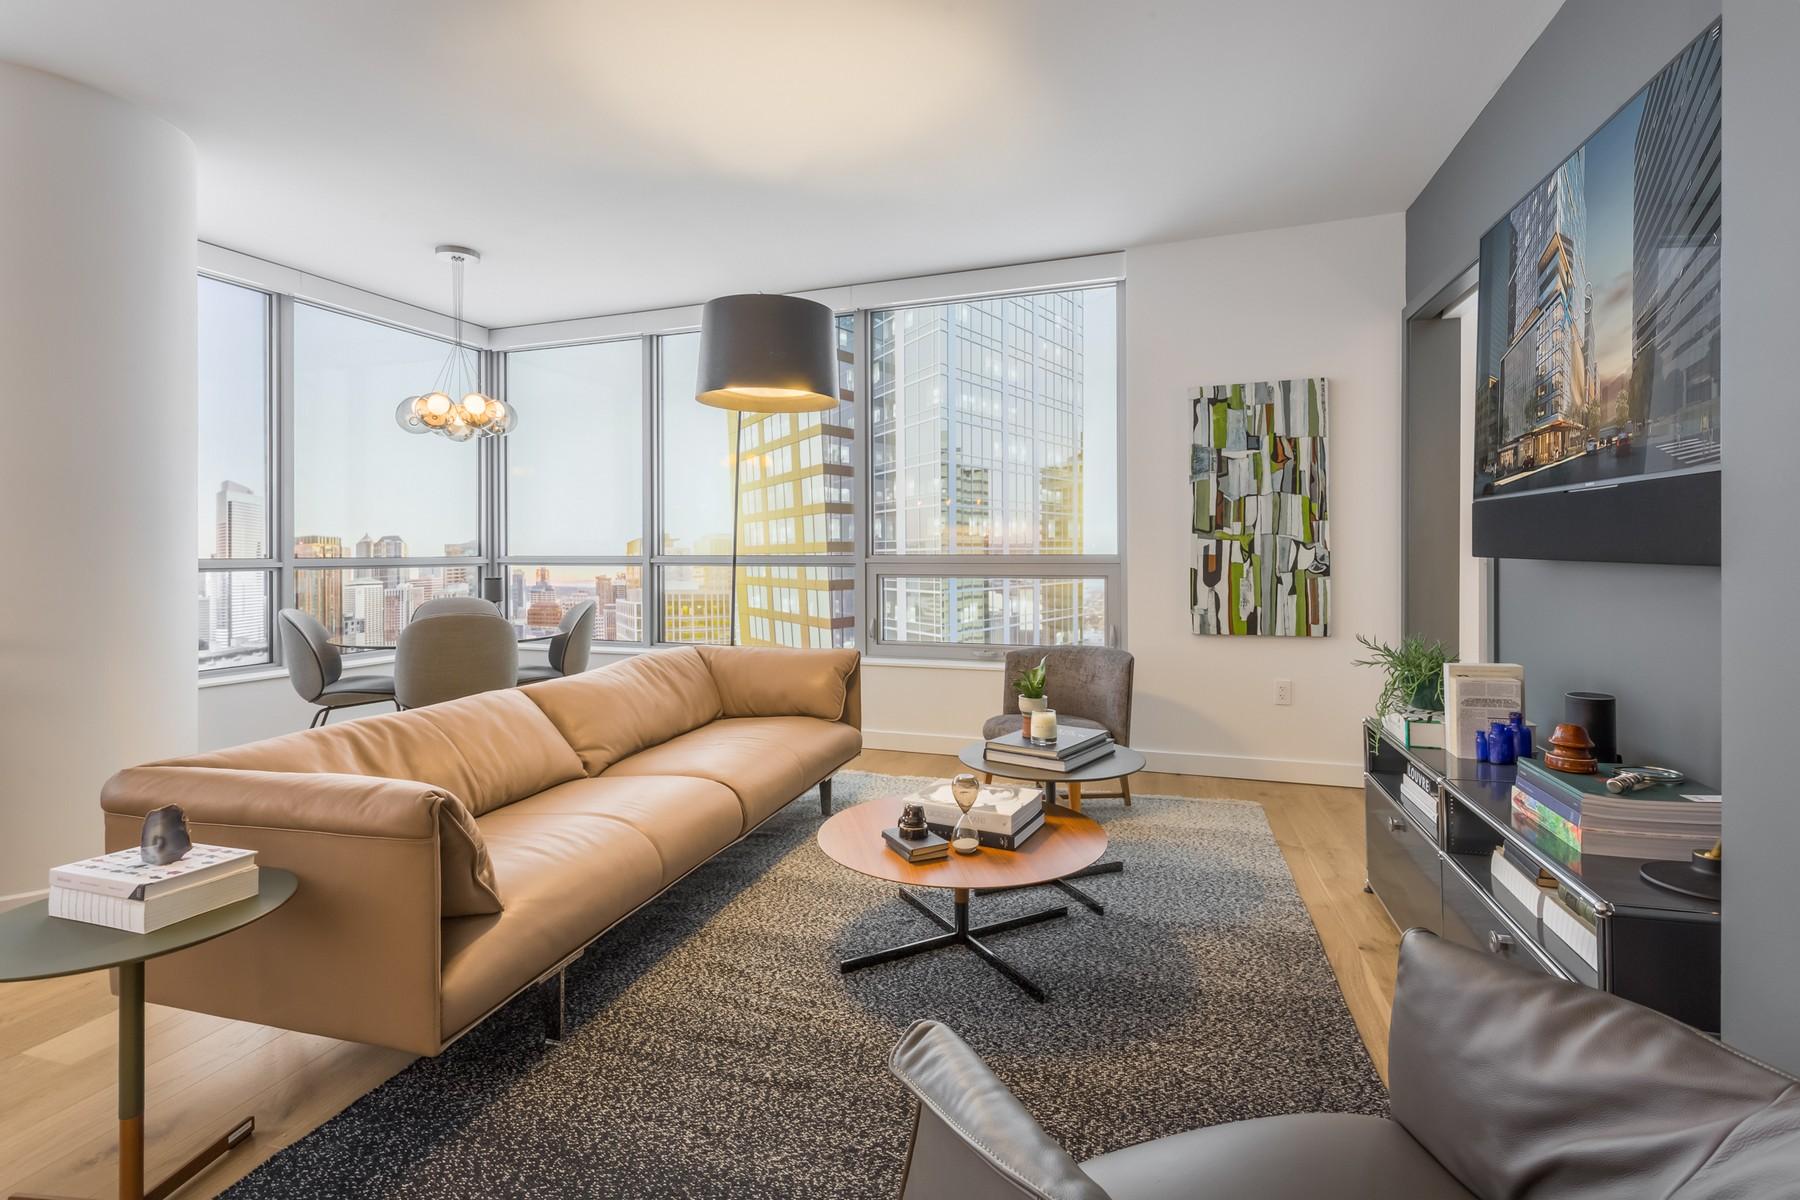 Additional photo for property listing at NEXUS #3302 1200 Howell #3302 Seattle, Washington 98101 United States